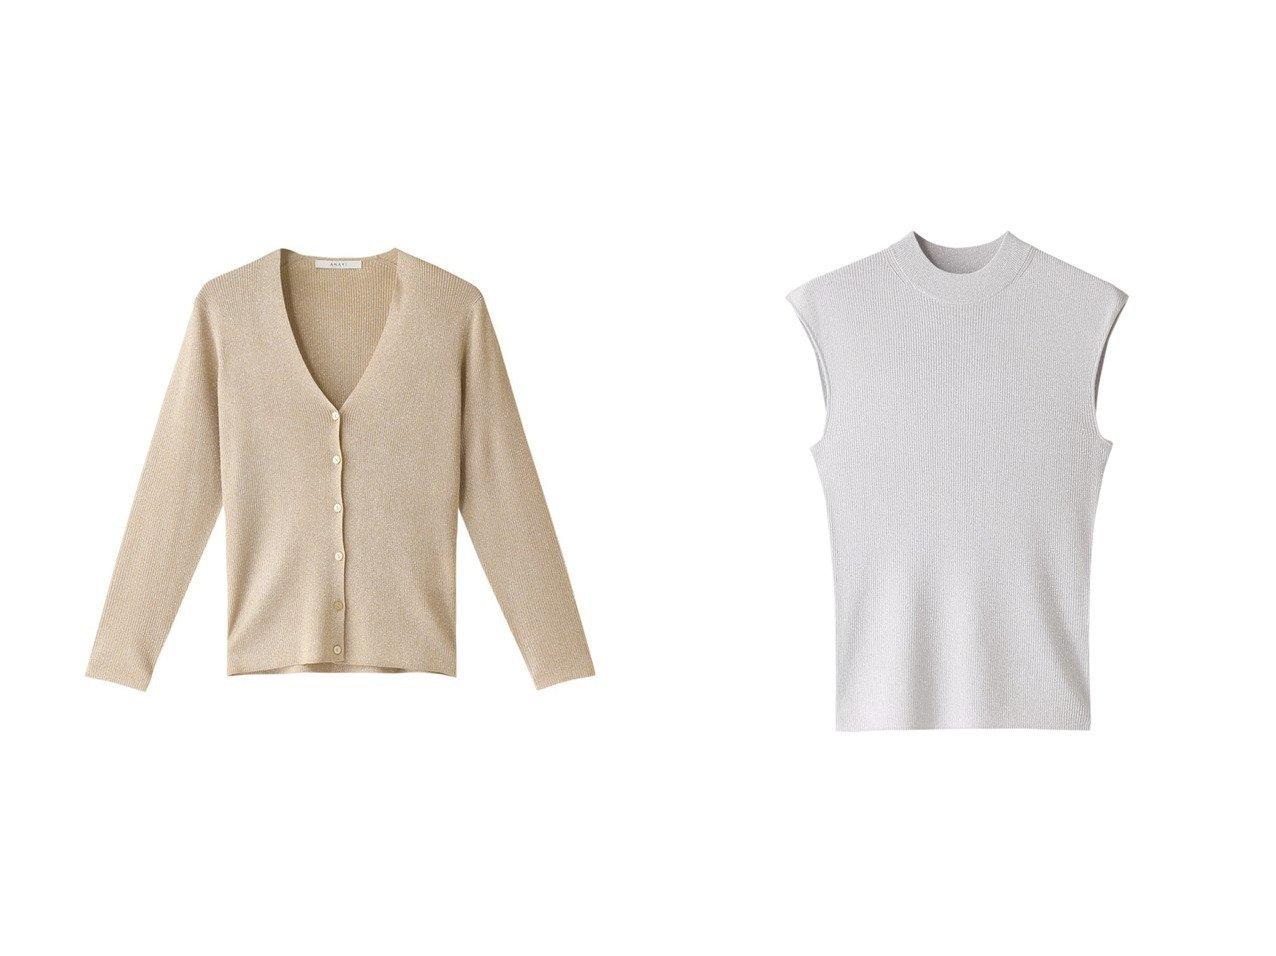 【ANAYI/アナイ】のラメリブノースリーブプルオーバー&ラメリブVネックカーディガン 【トップス・カットソー】おすすめ!人気、トレンド・レディースファッションの通販  おすすめで人気の流行・トレンド、ファッションの通販商品 メンズファッション・キッズファッション・インテリア・家具・レディースファッション・服の通販 founy(ファニー) https://founy.com/ ファッション Fashion レディースファッション WOMEN トップス・カットソー Tops/Tshirt ニット Knit Tops カーディガン Cardigans Vネック V-Neck キャミソール / ノースリーブ No Sleeves プルオーバー Pullover 2021年 2021 2021春夏・S/S SS/Spring/Summer/2021 S/S・春夏 SS・Spring/Summer カーディガン コンパクト 春 Spring |ID:crp329100000028273